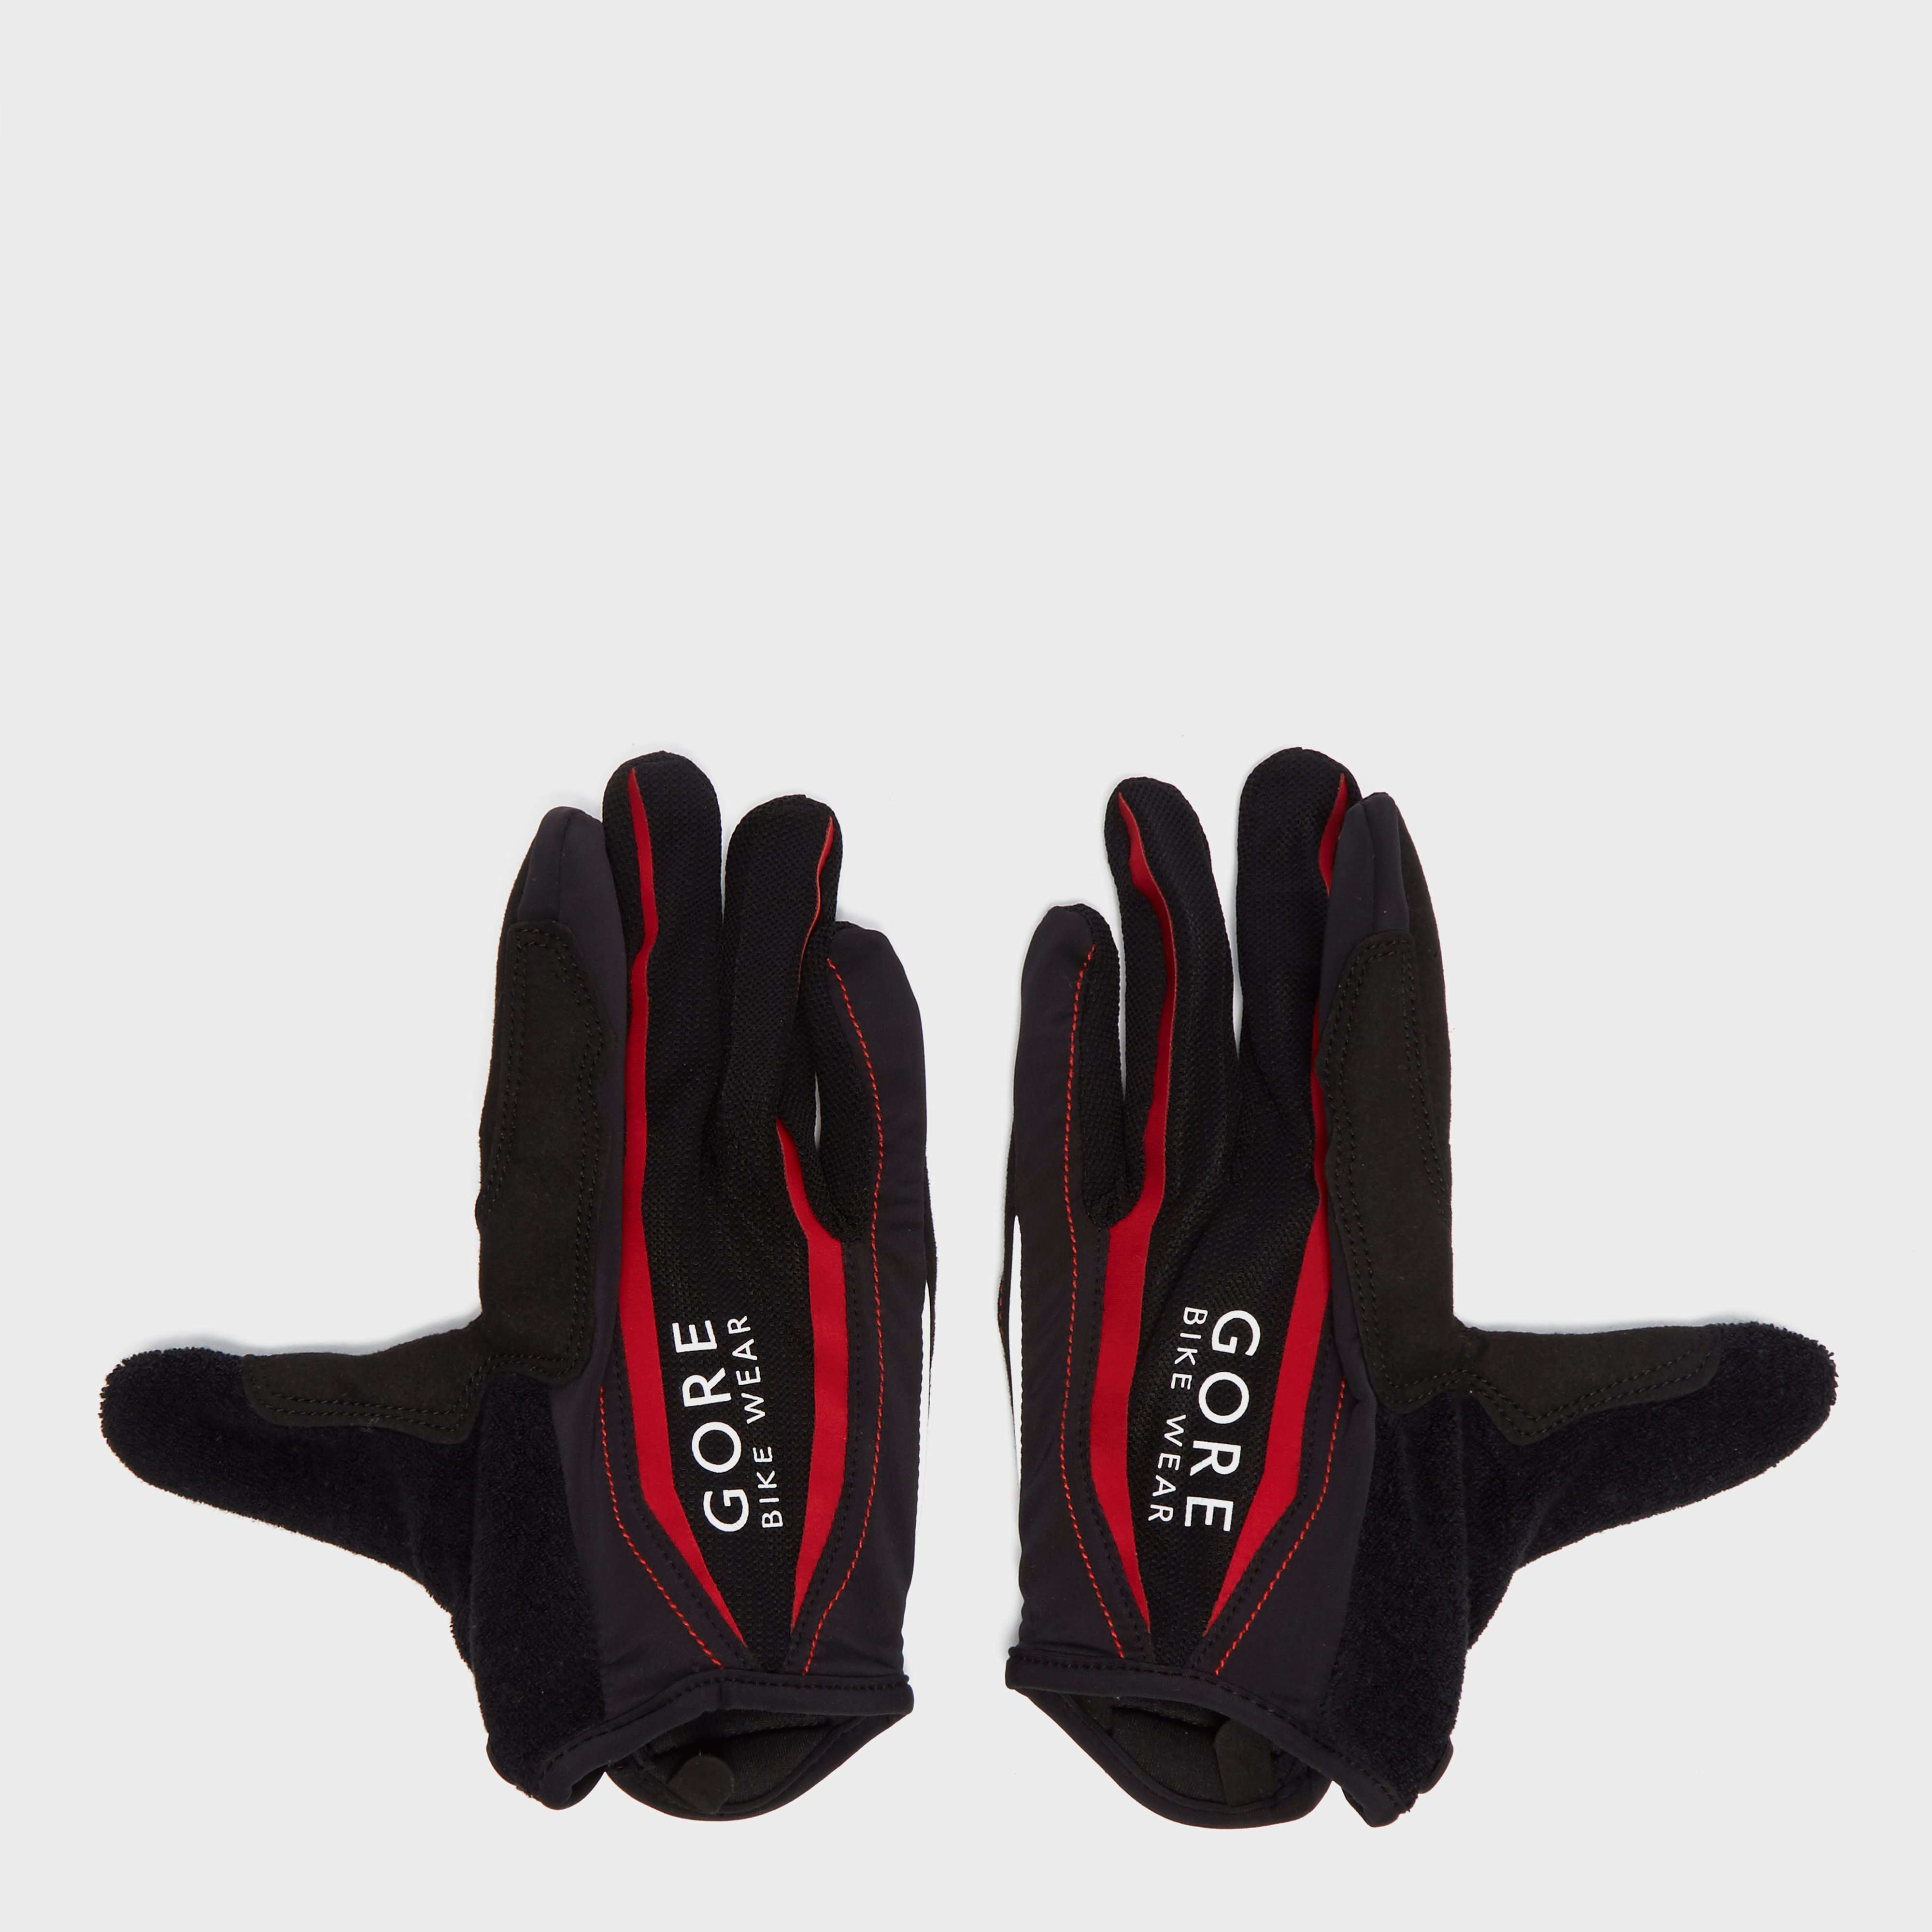 GORE Power Long Gloves